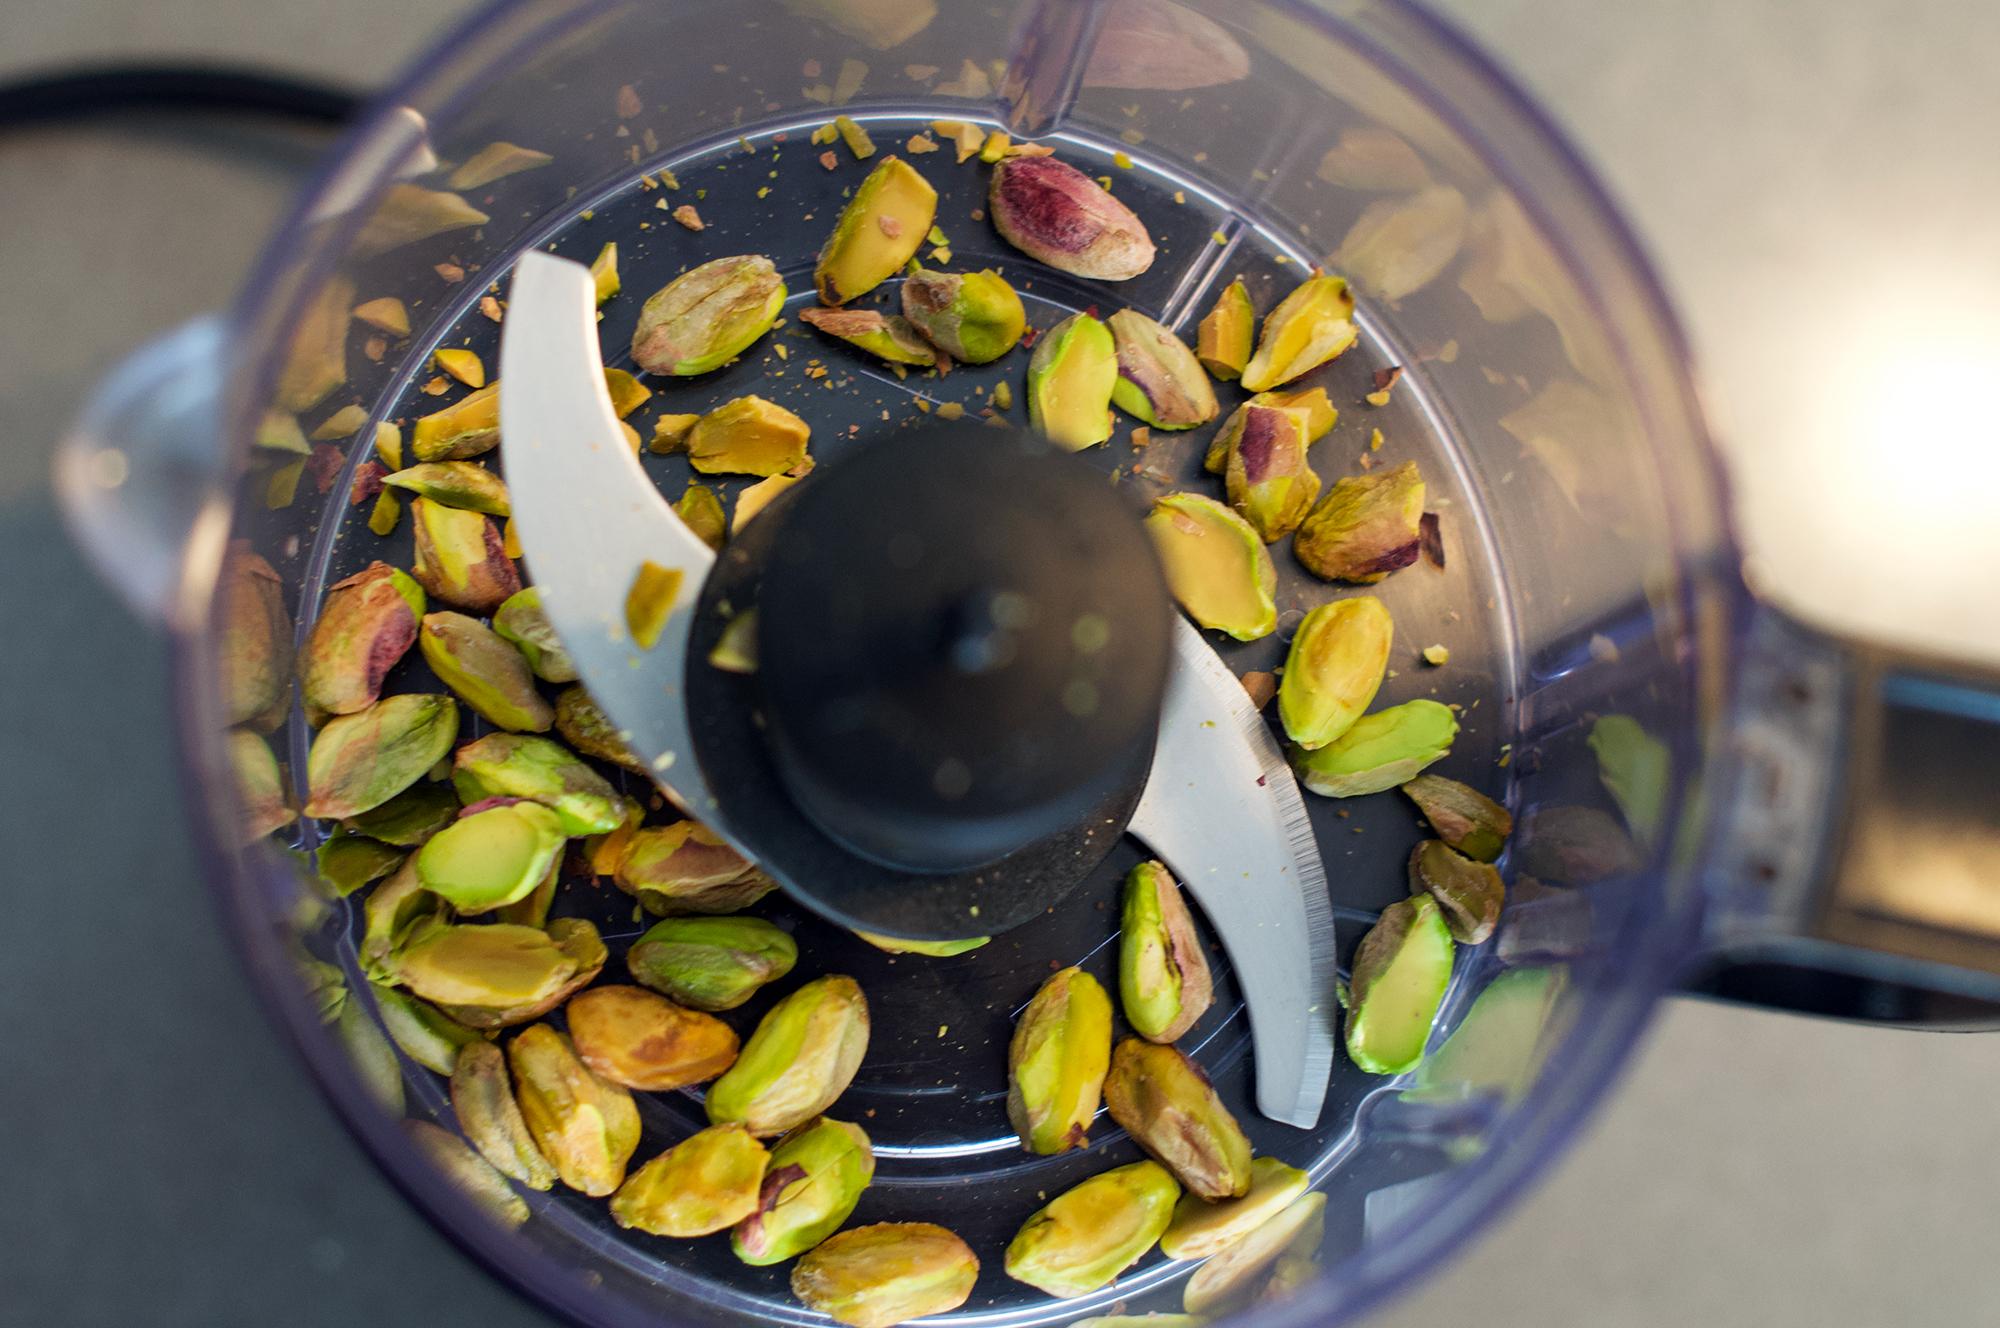 Chopped pistachio kernels in mini chopper food processor KitchenAid